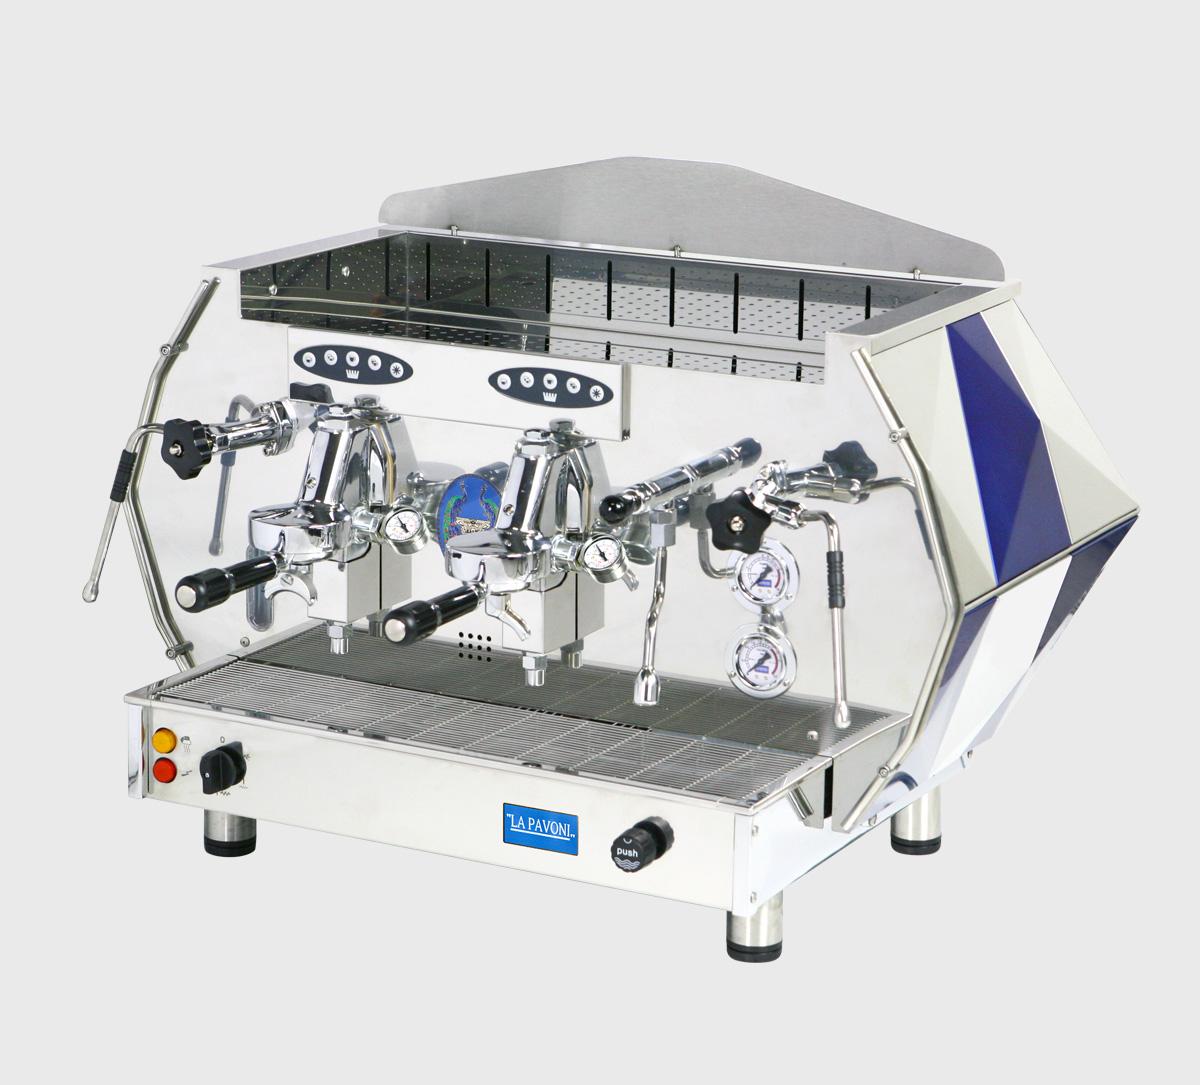 la pavoni diamante 2 group sv automatic електронна професионална кафемашина с 2 групи с ретро дизайн